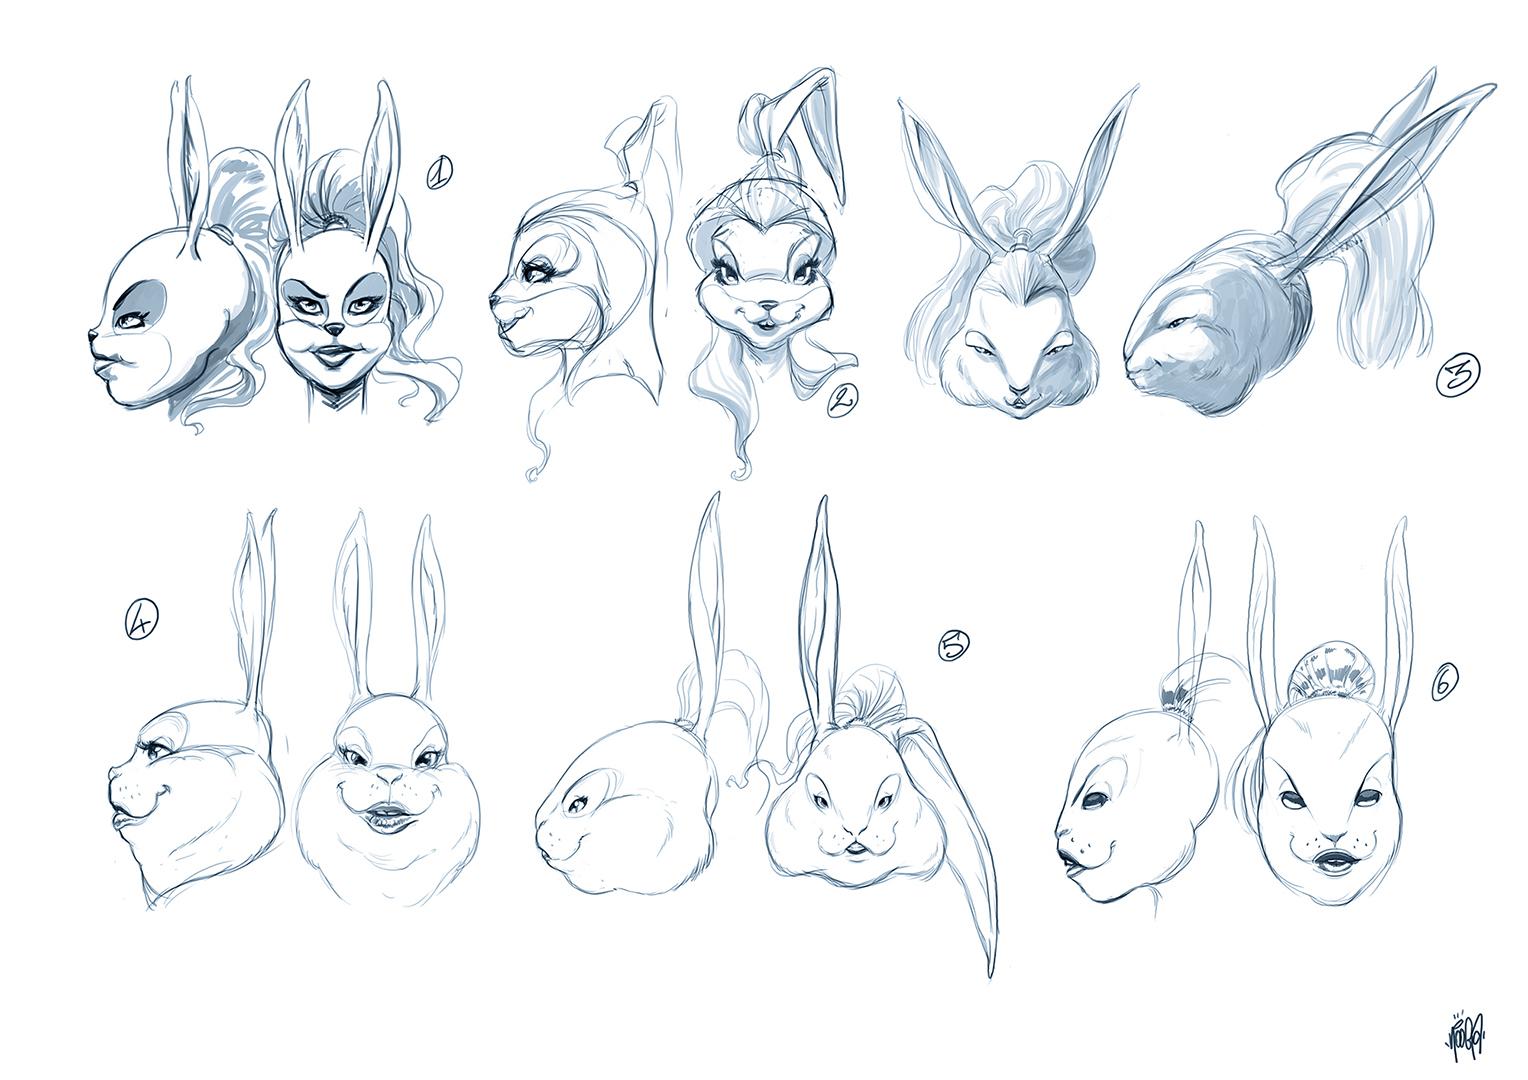 character design-kaycee_3 noogadesign